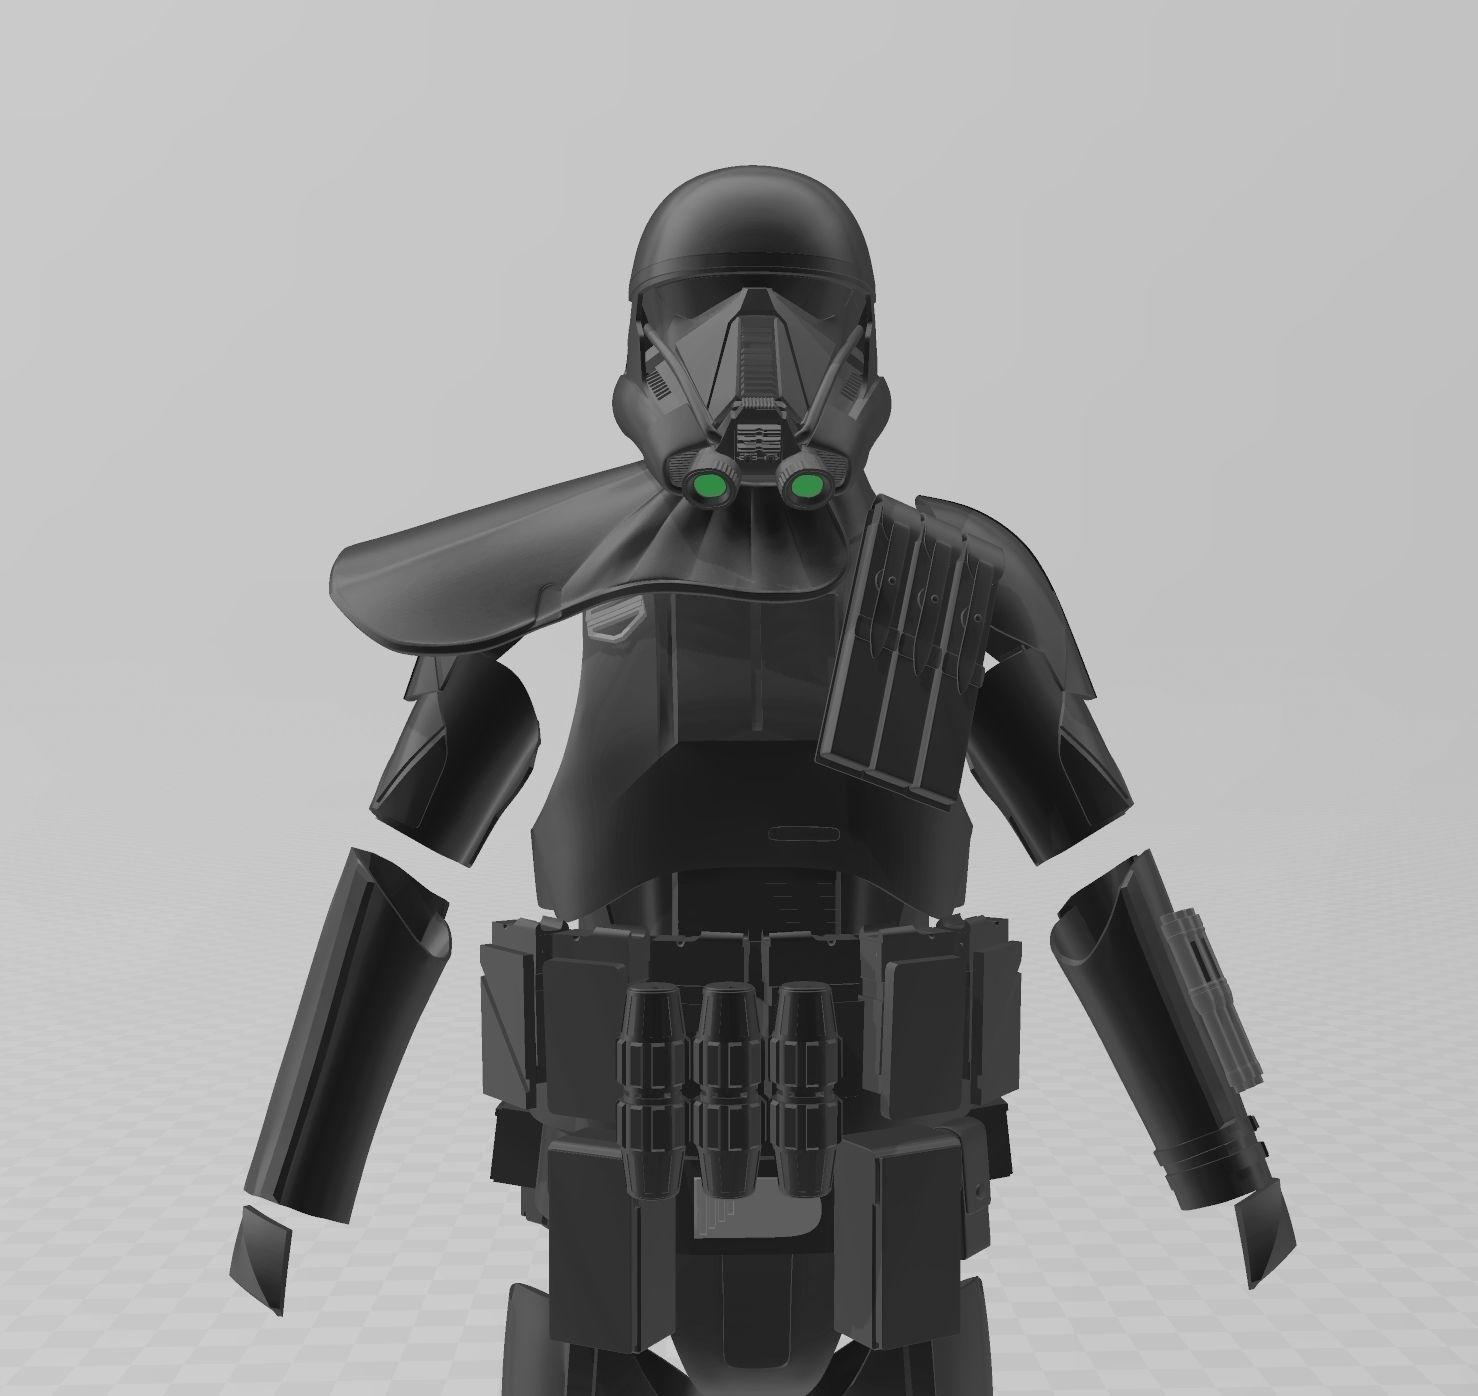 Star Wars Rogue One Death Trooper Full Armor